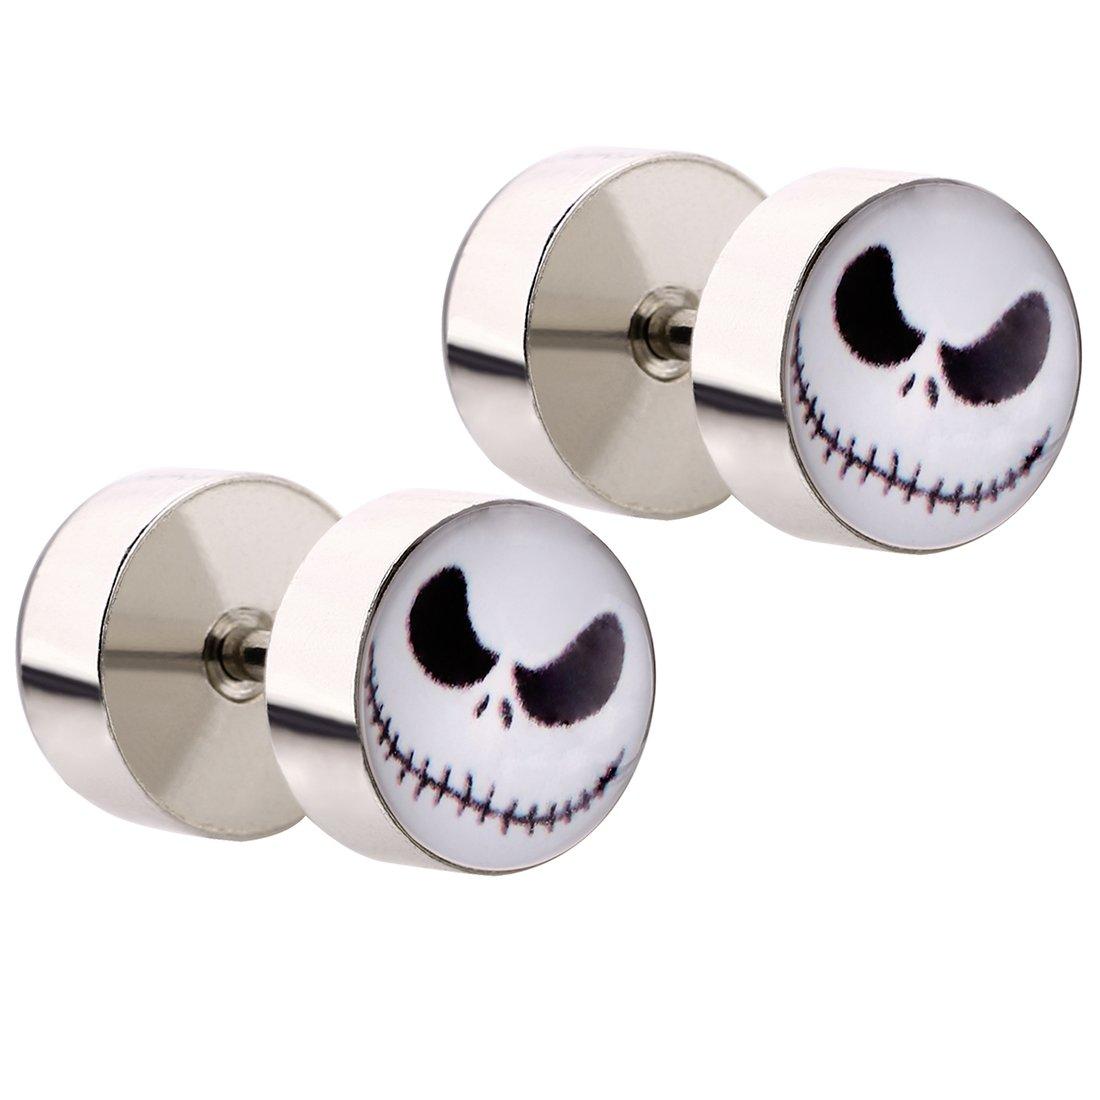 Mecoo 5 Pairs Hypoallergenic Medical Steel Piercing Jewelry Jack Logo Ear Piercing